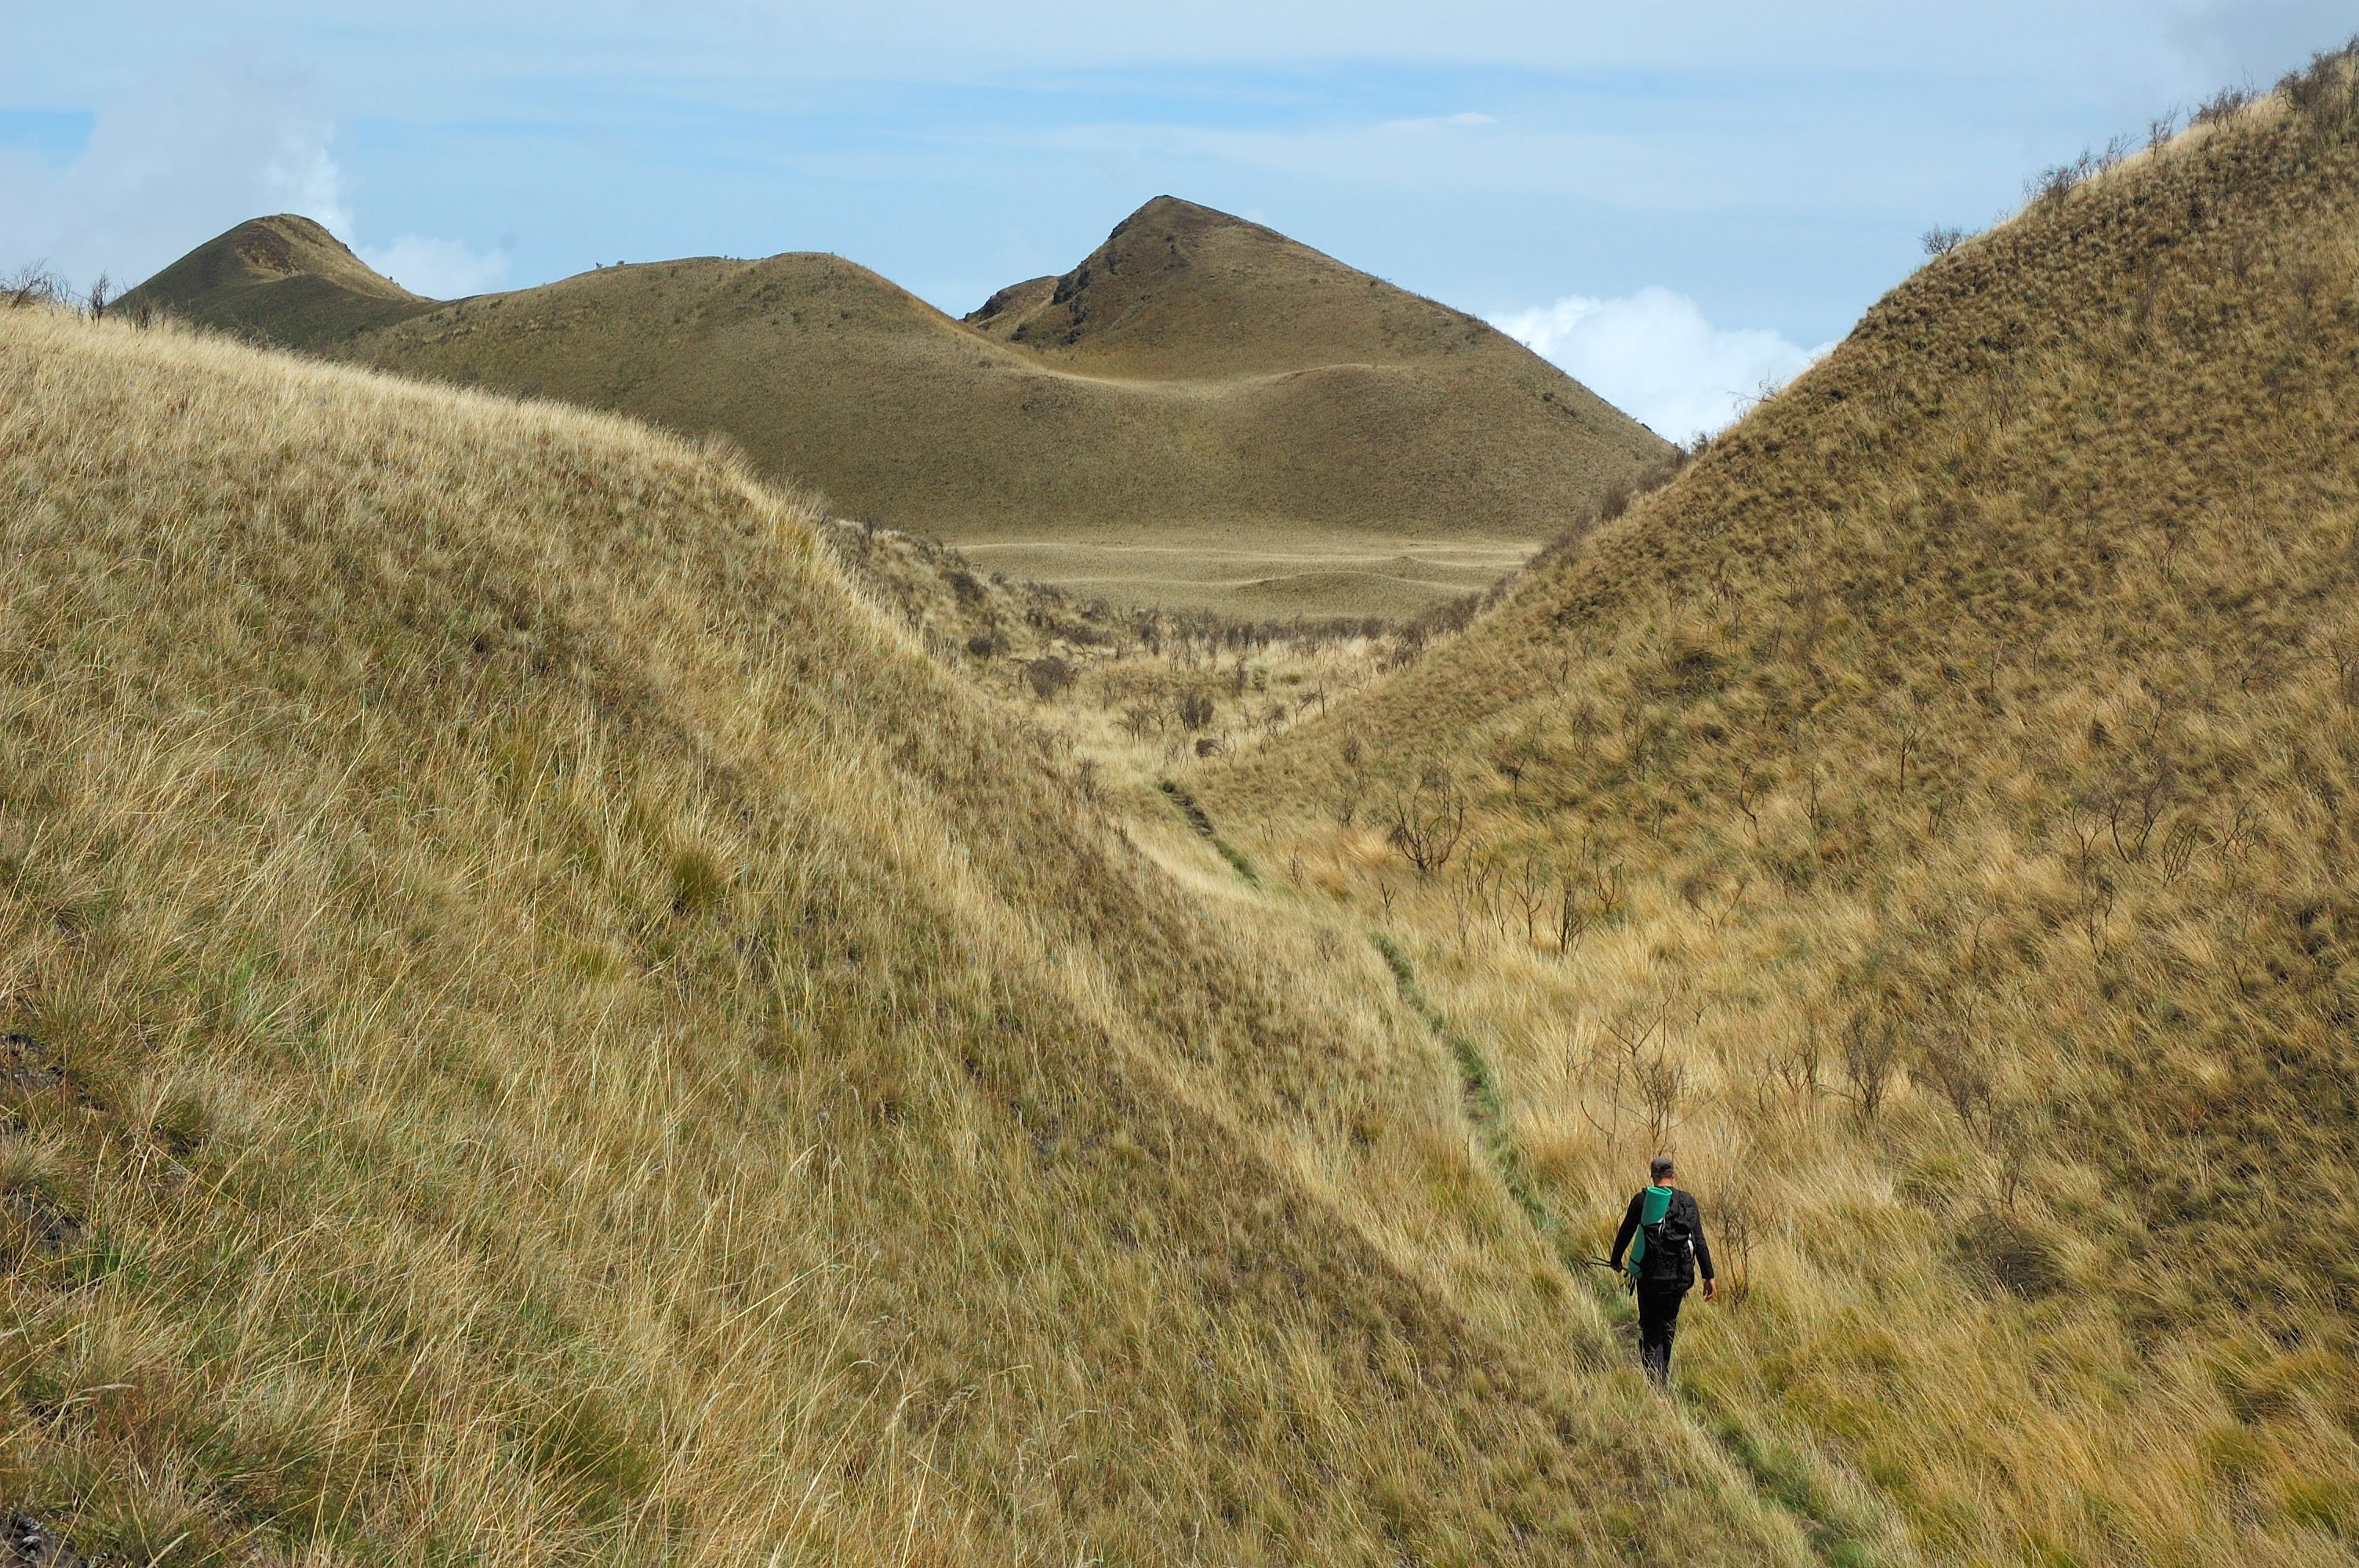 Hiker near volcano crater